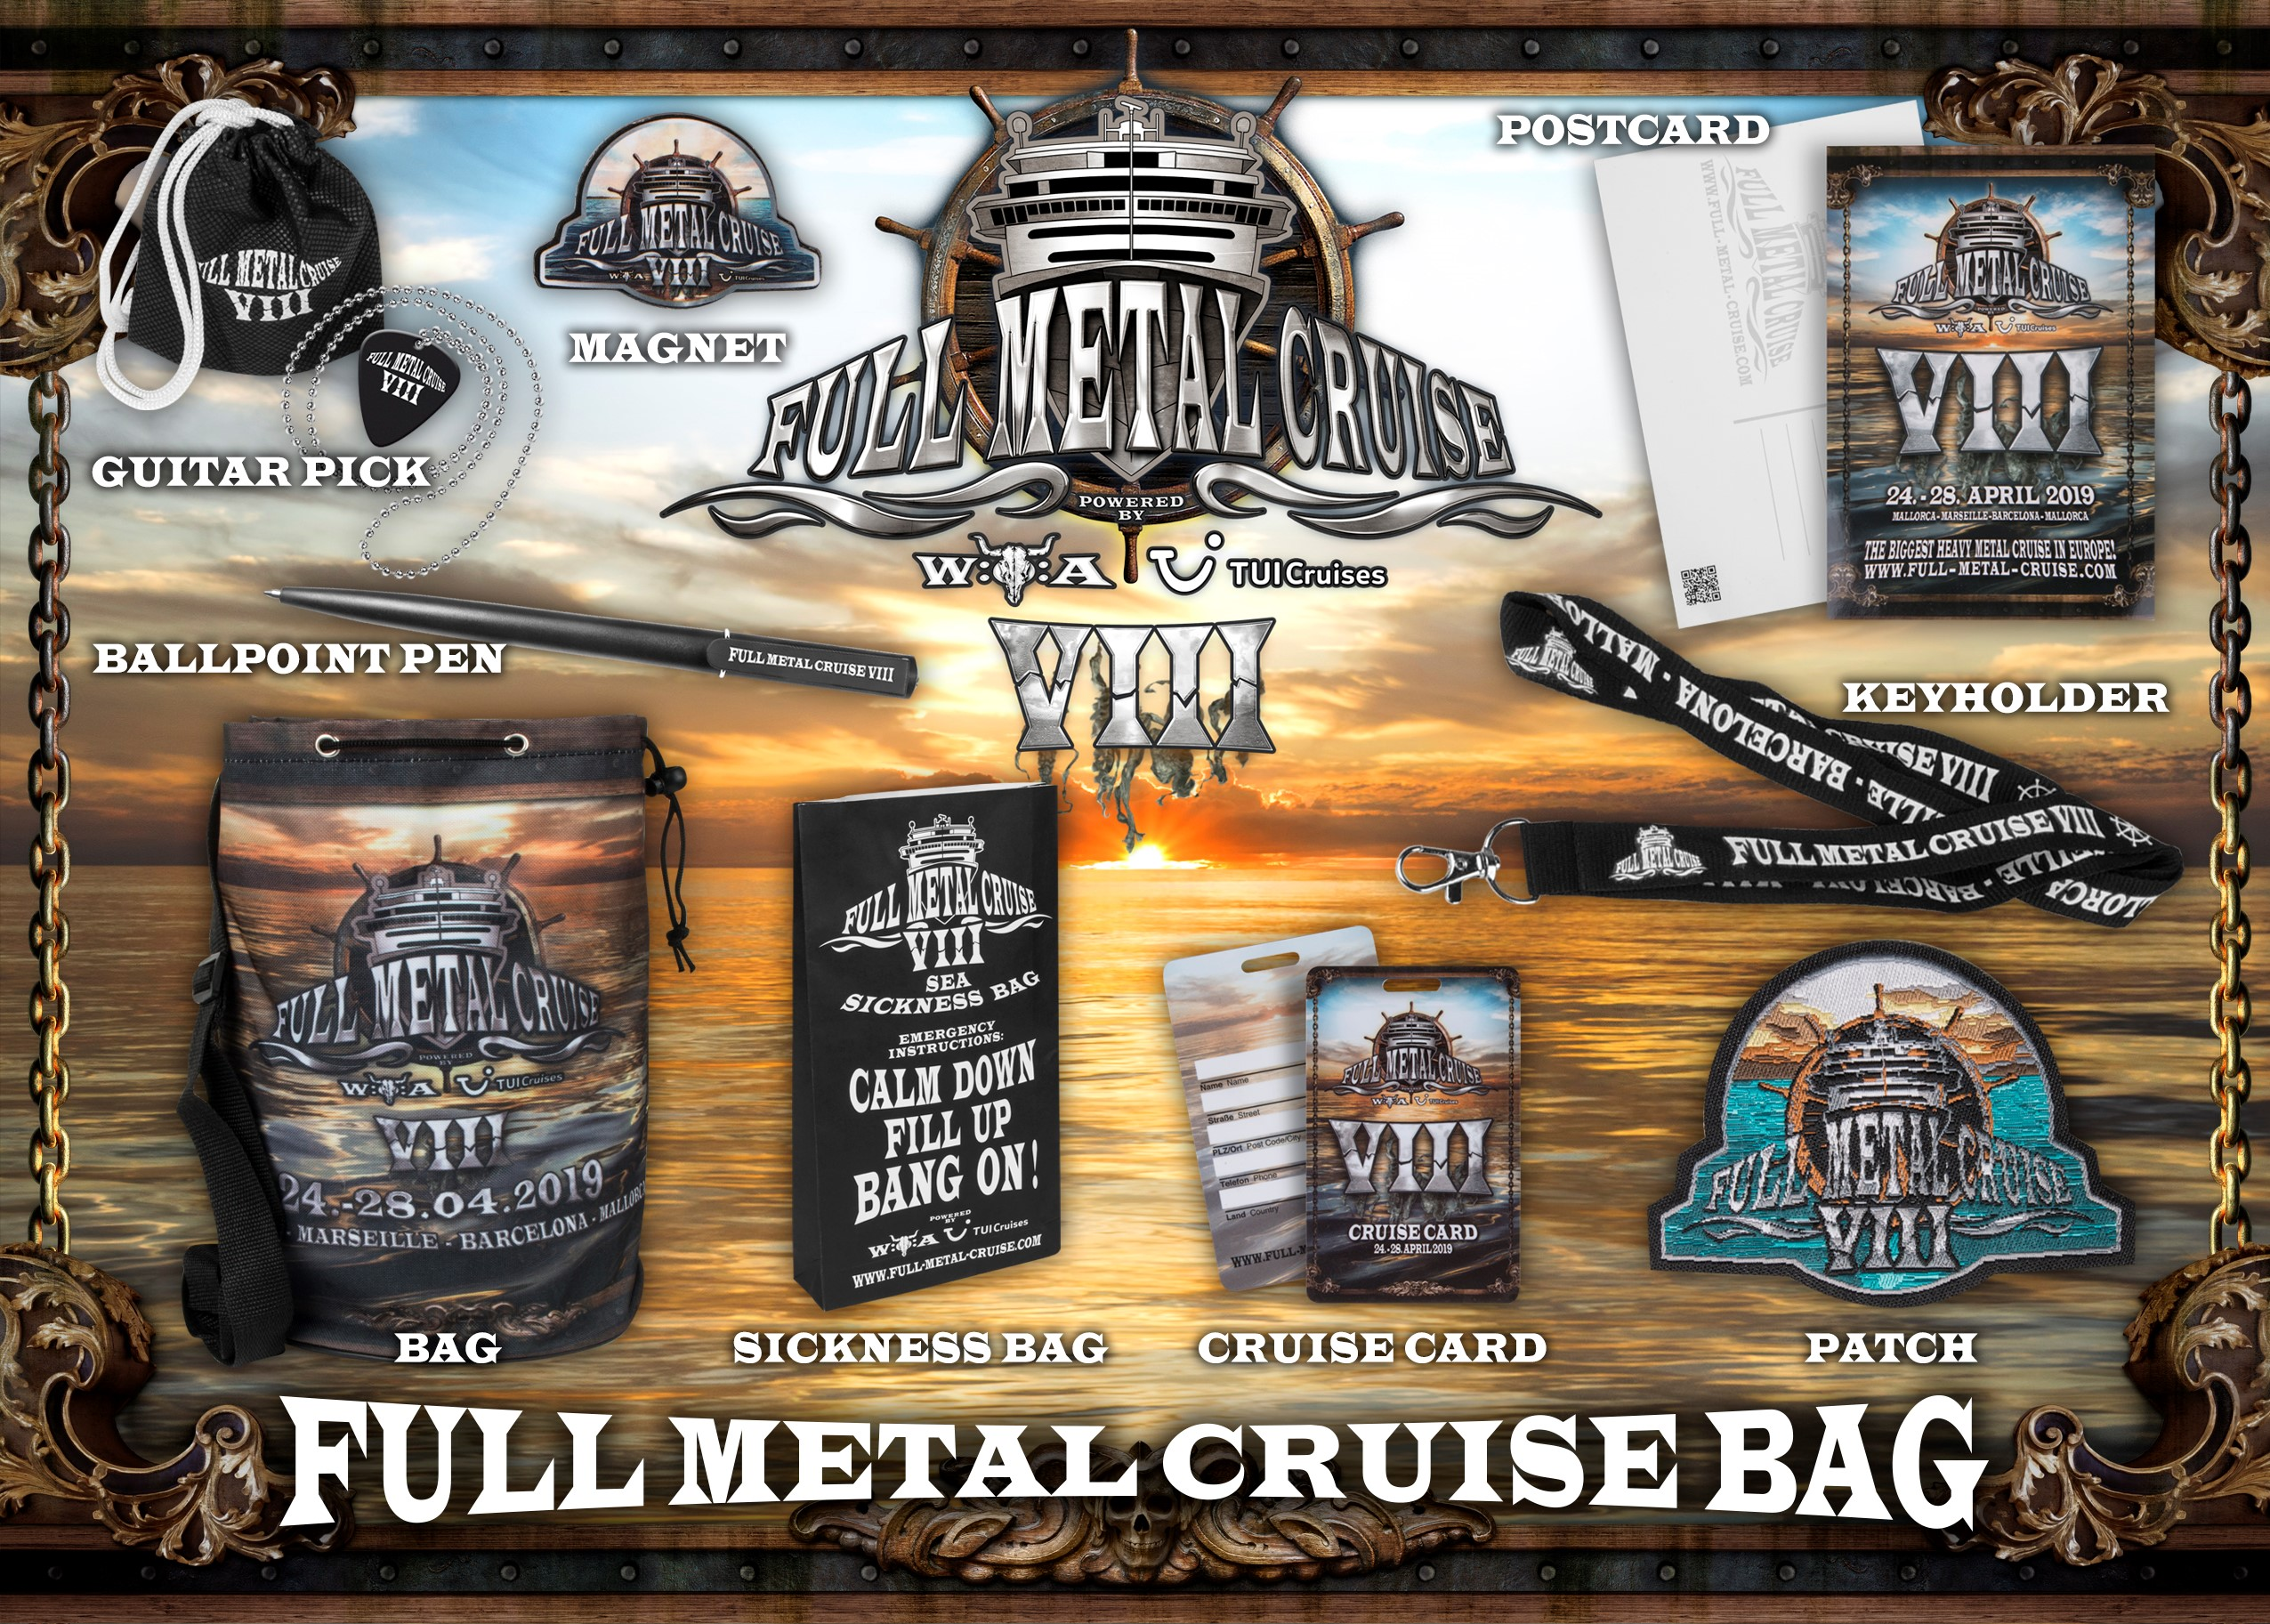 Das Full Metal Cruise Bag für die FMC VIII